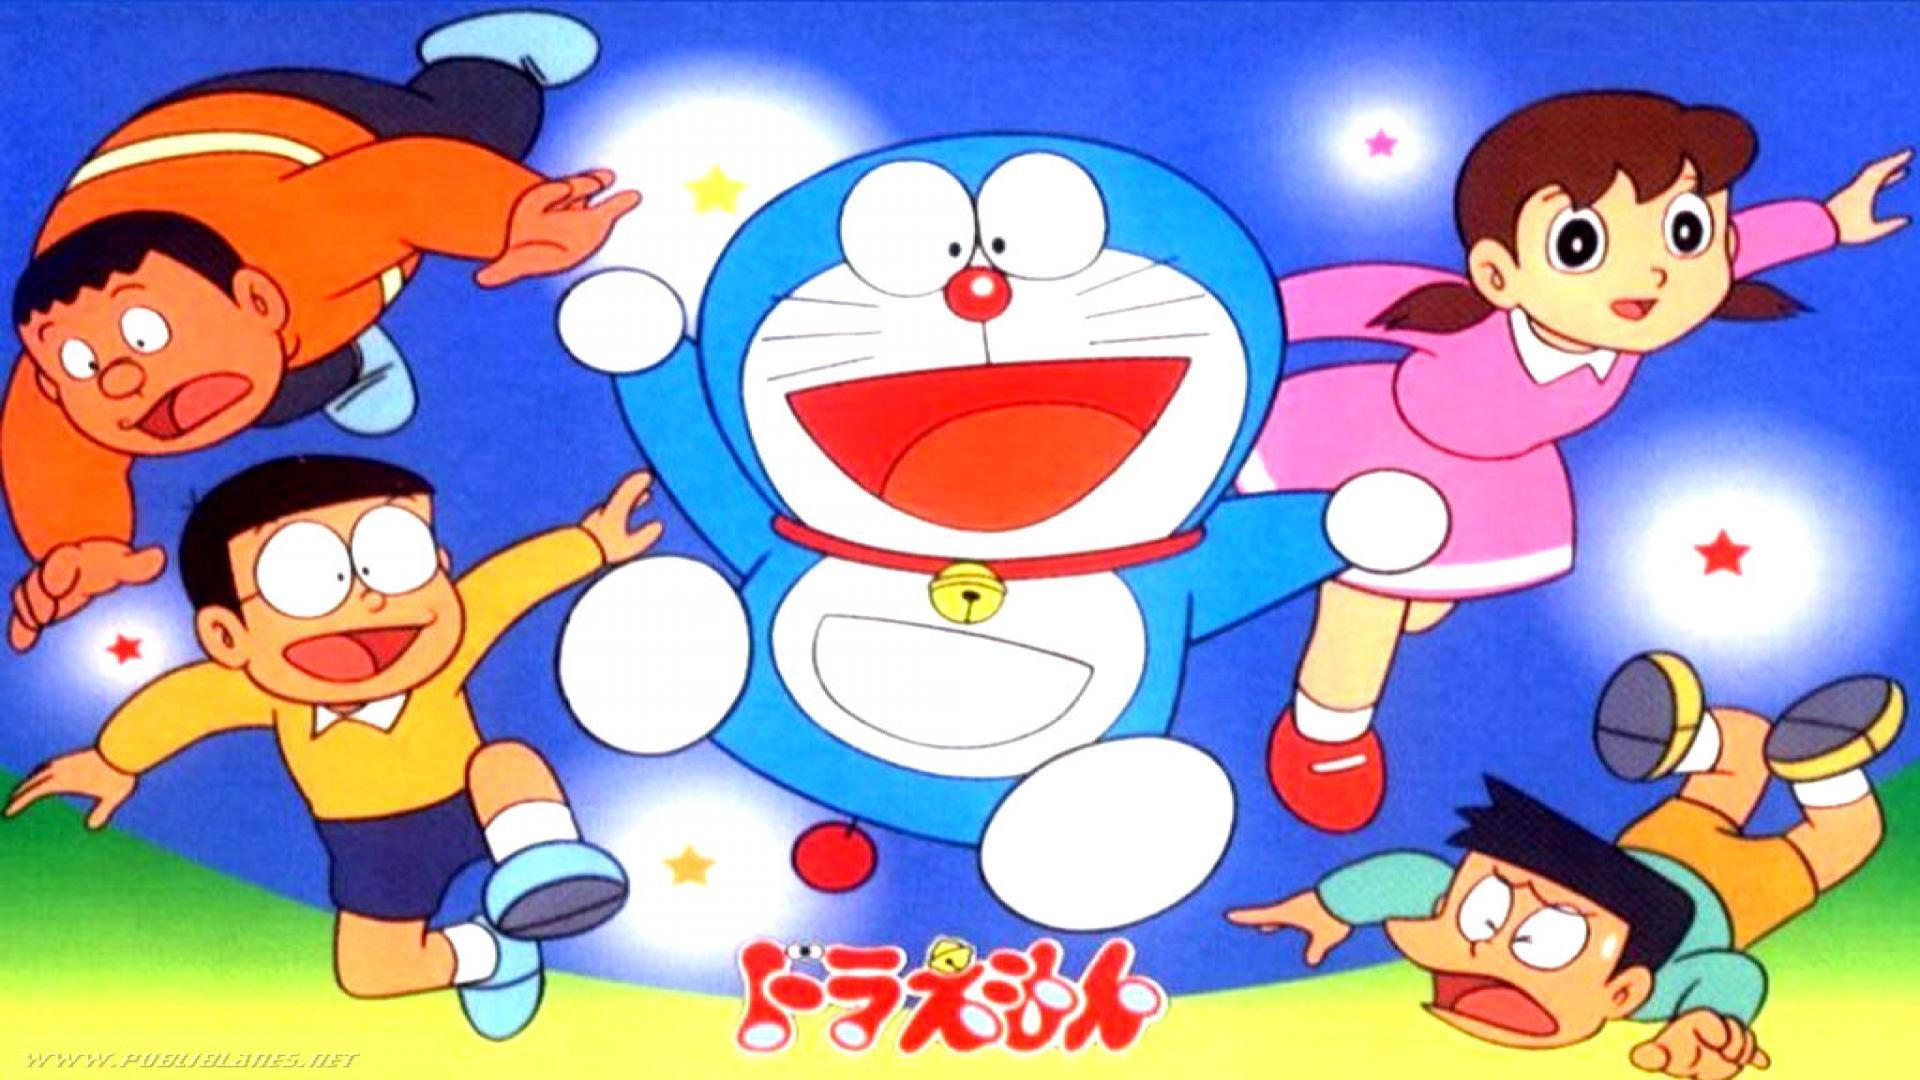 Images For > Doraemon Images Hd